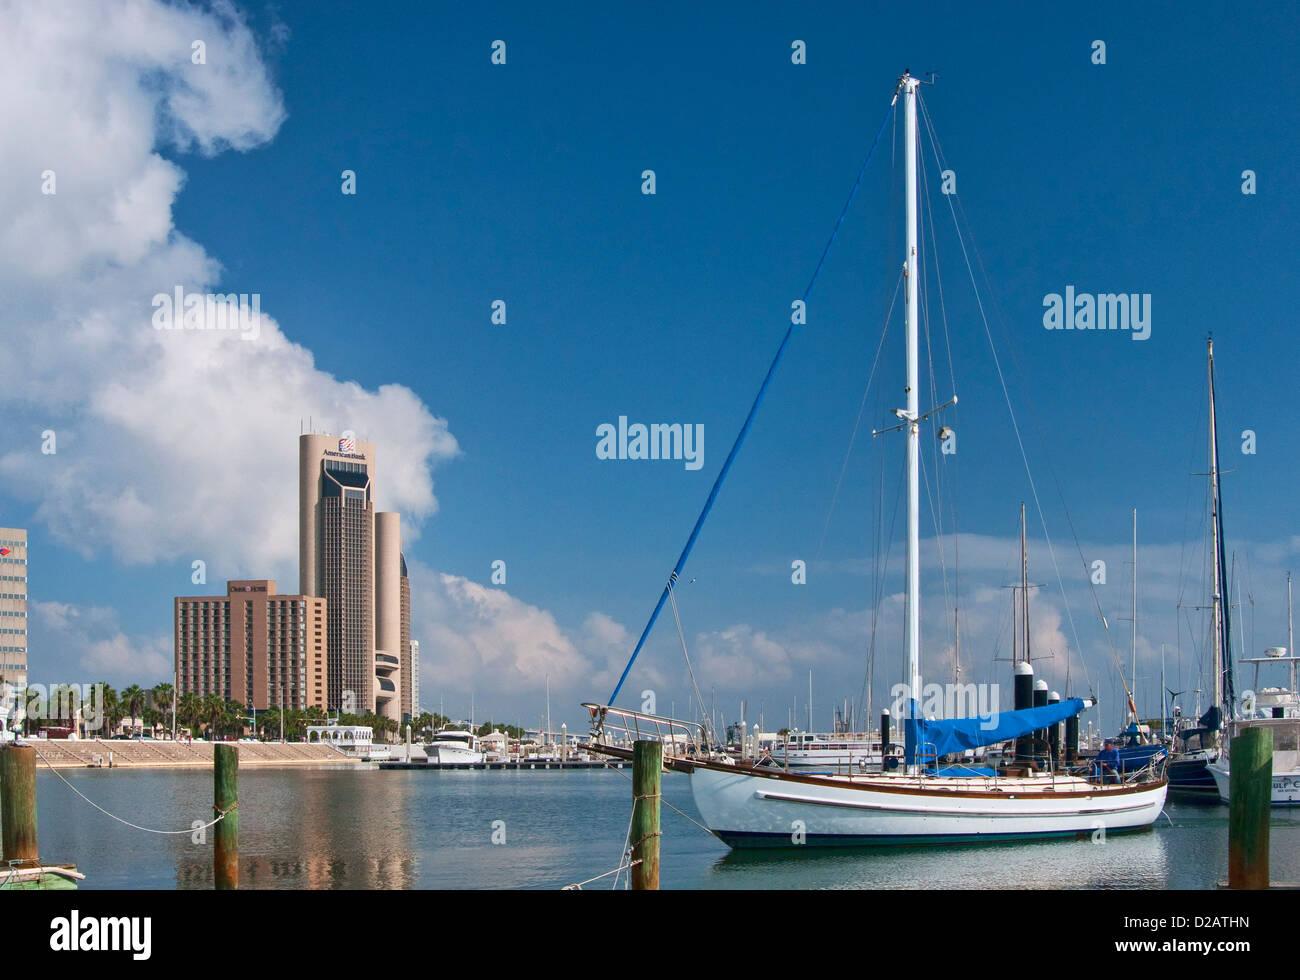 Pleasure boat at Lawrence Street T-Head pier marina, downtown towers behind at Corpus Christi Bay, Corpus Christi, - Stock Image